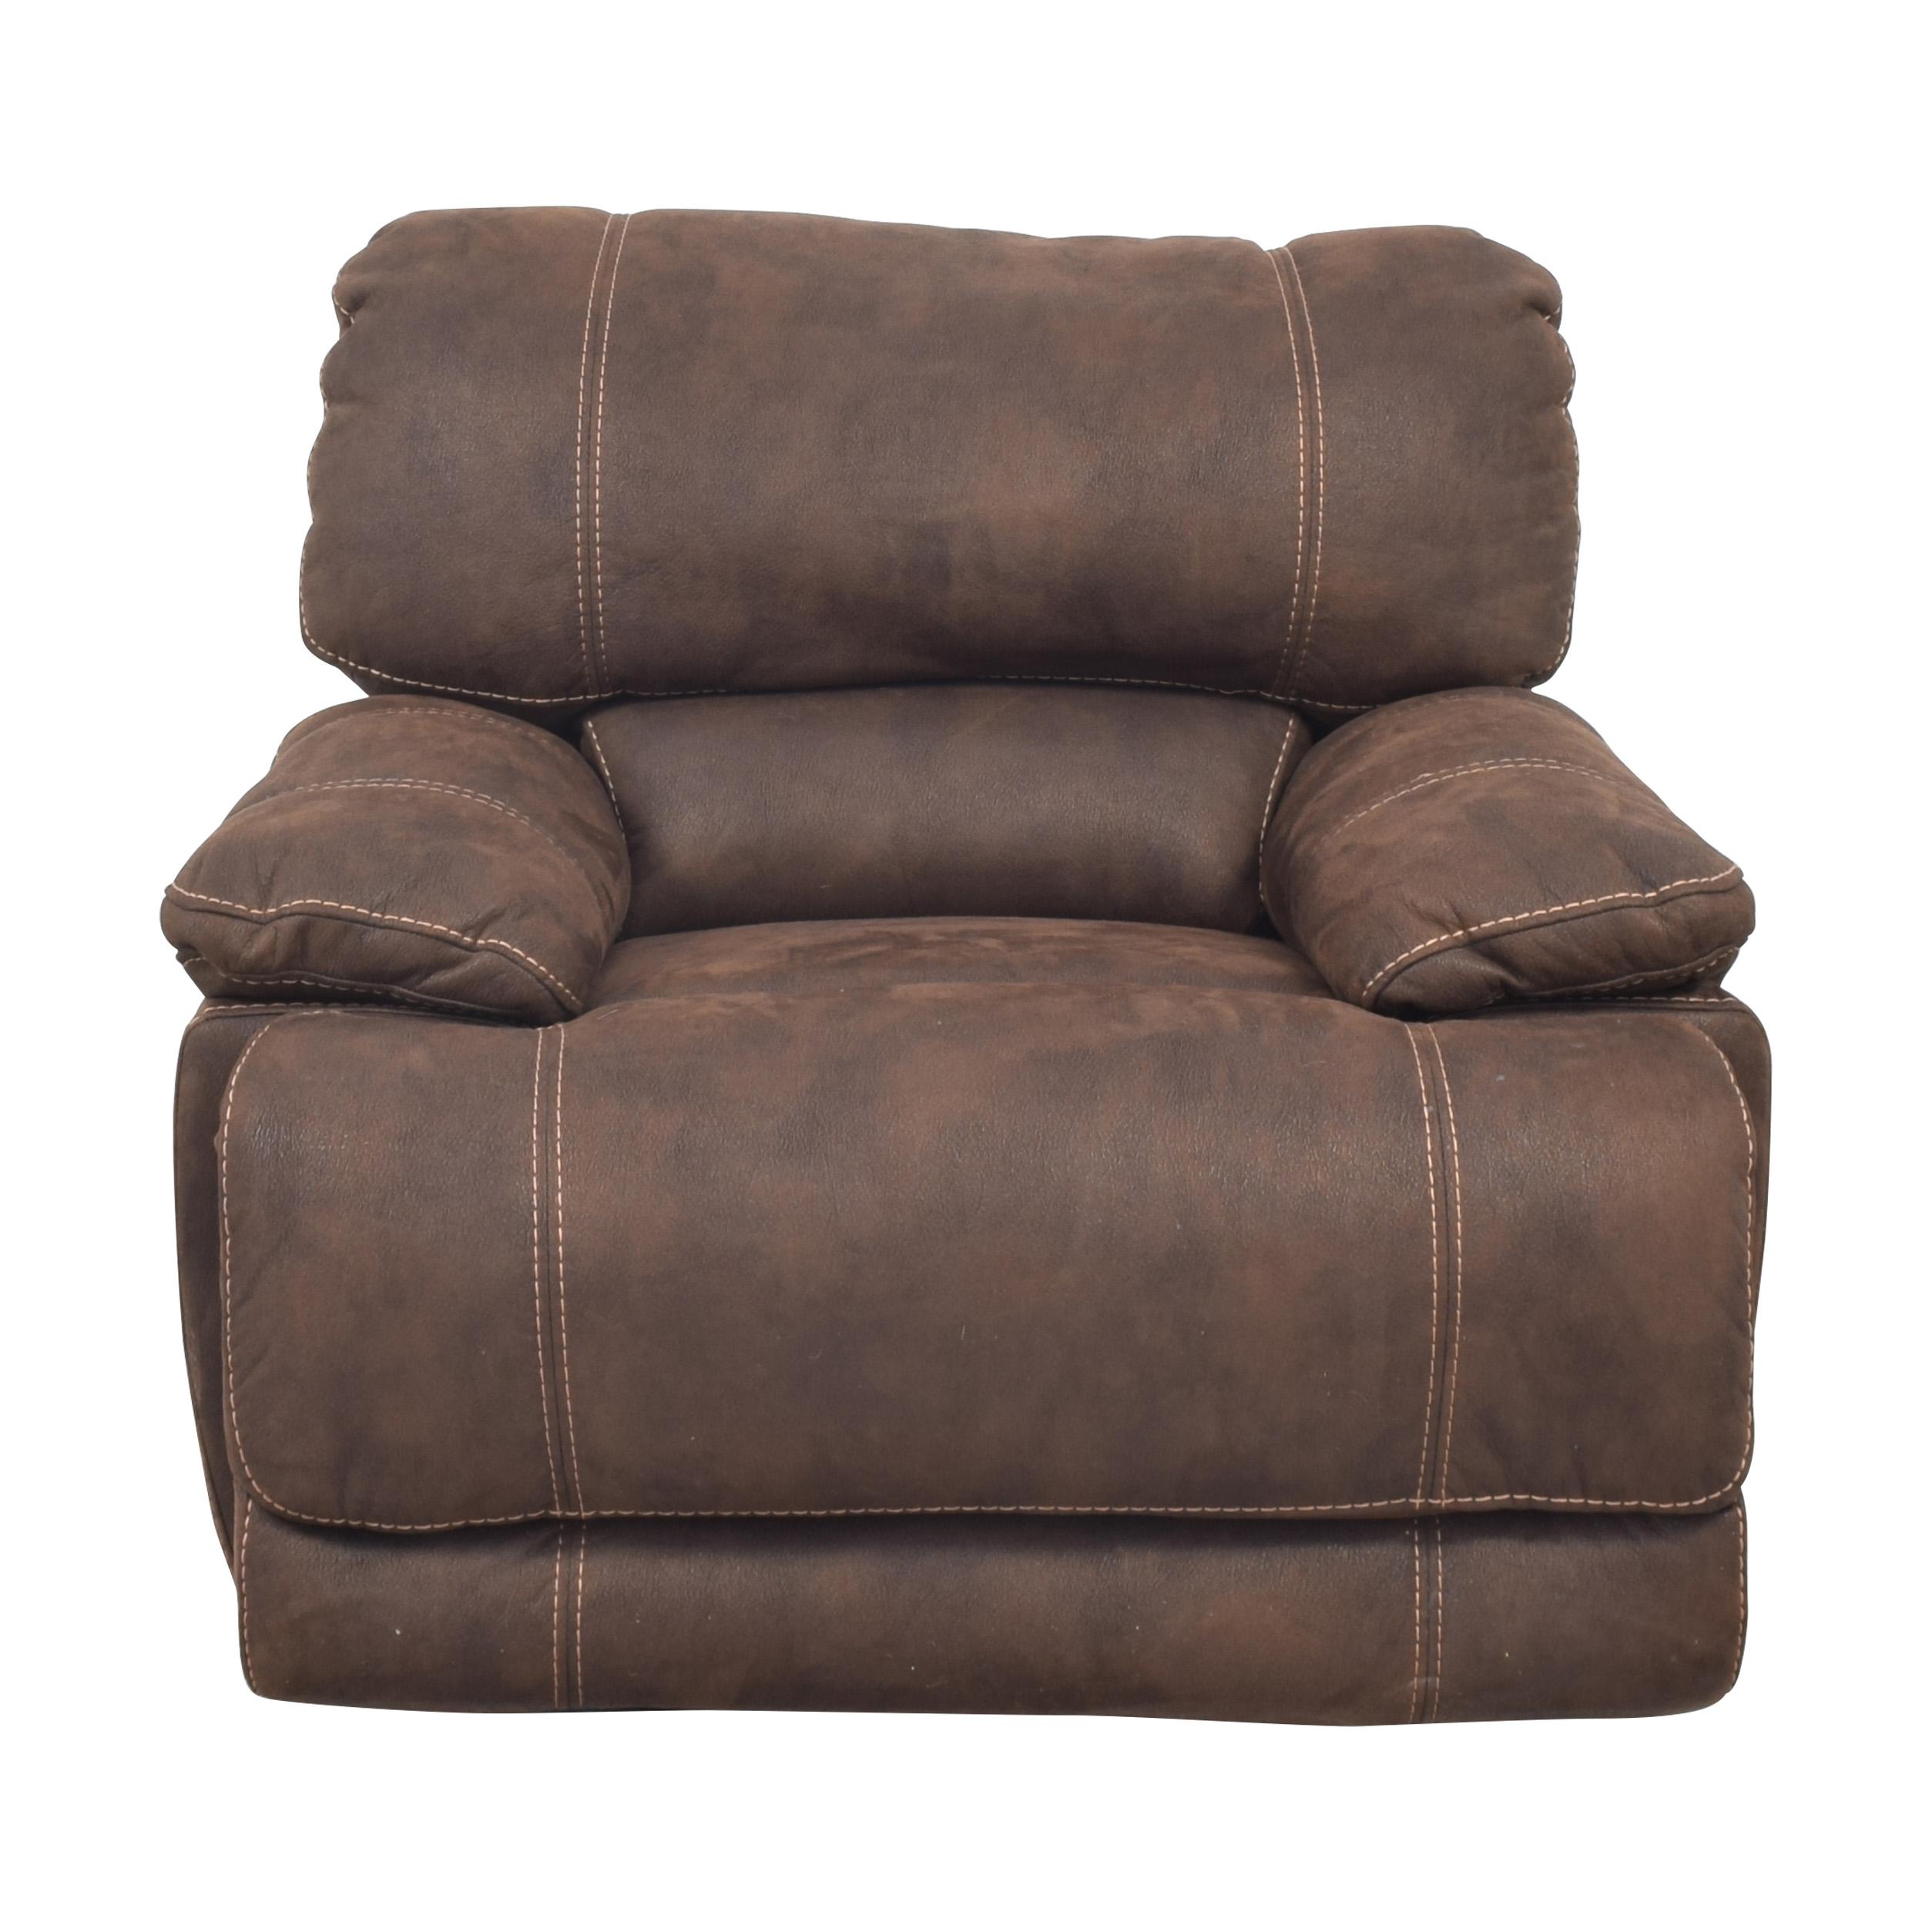 Macy's Macy's Upholstered Recliner price